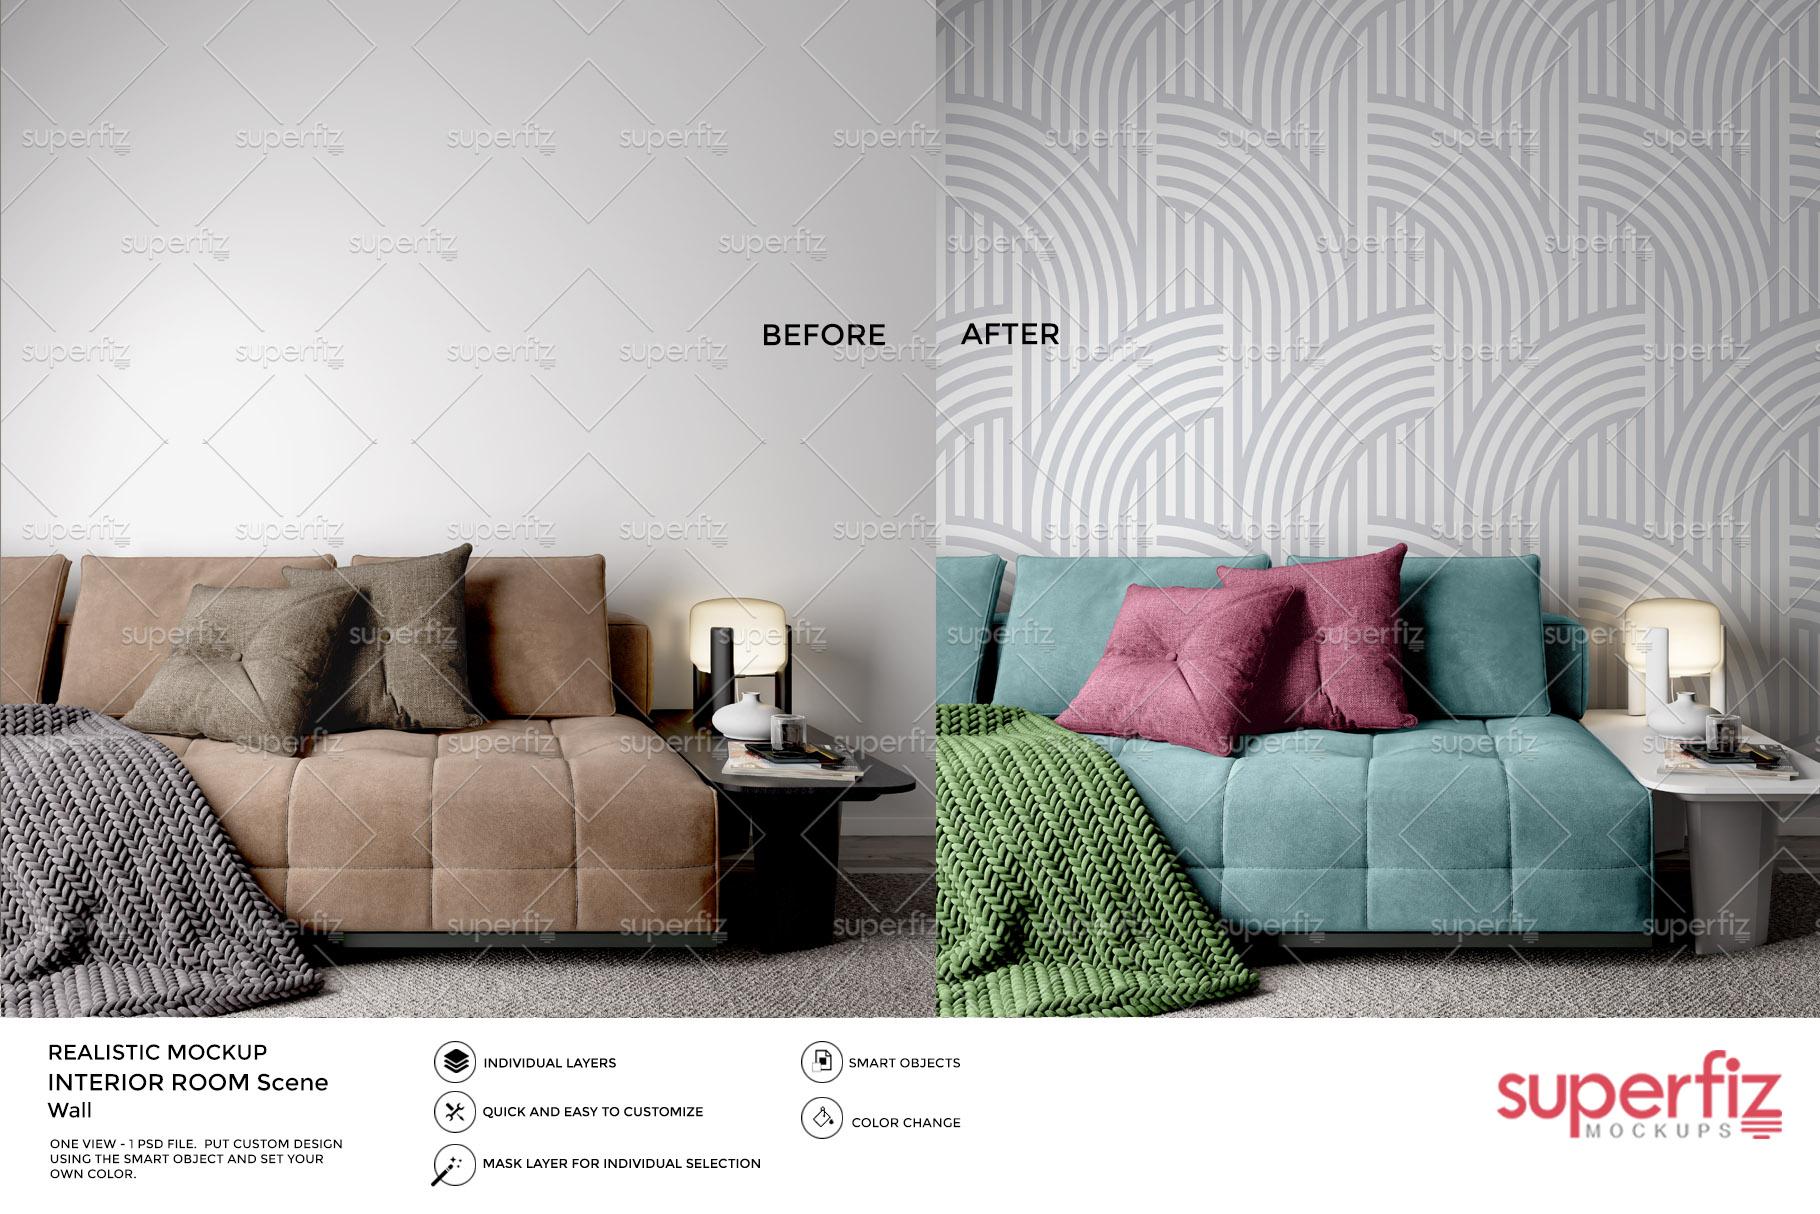 Wallpaper Mockup Bundle Vol.2 - SM98PACK - 5PSD SCENE example image 4